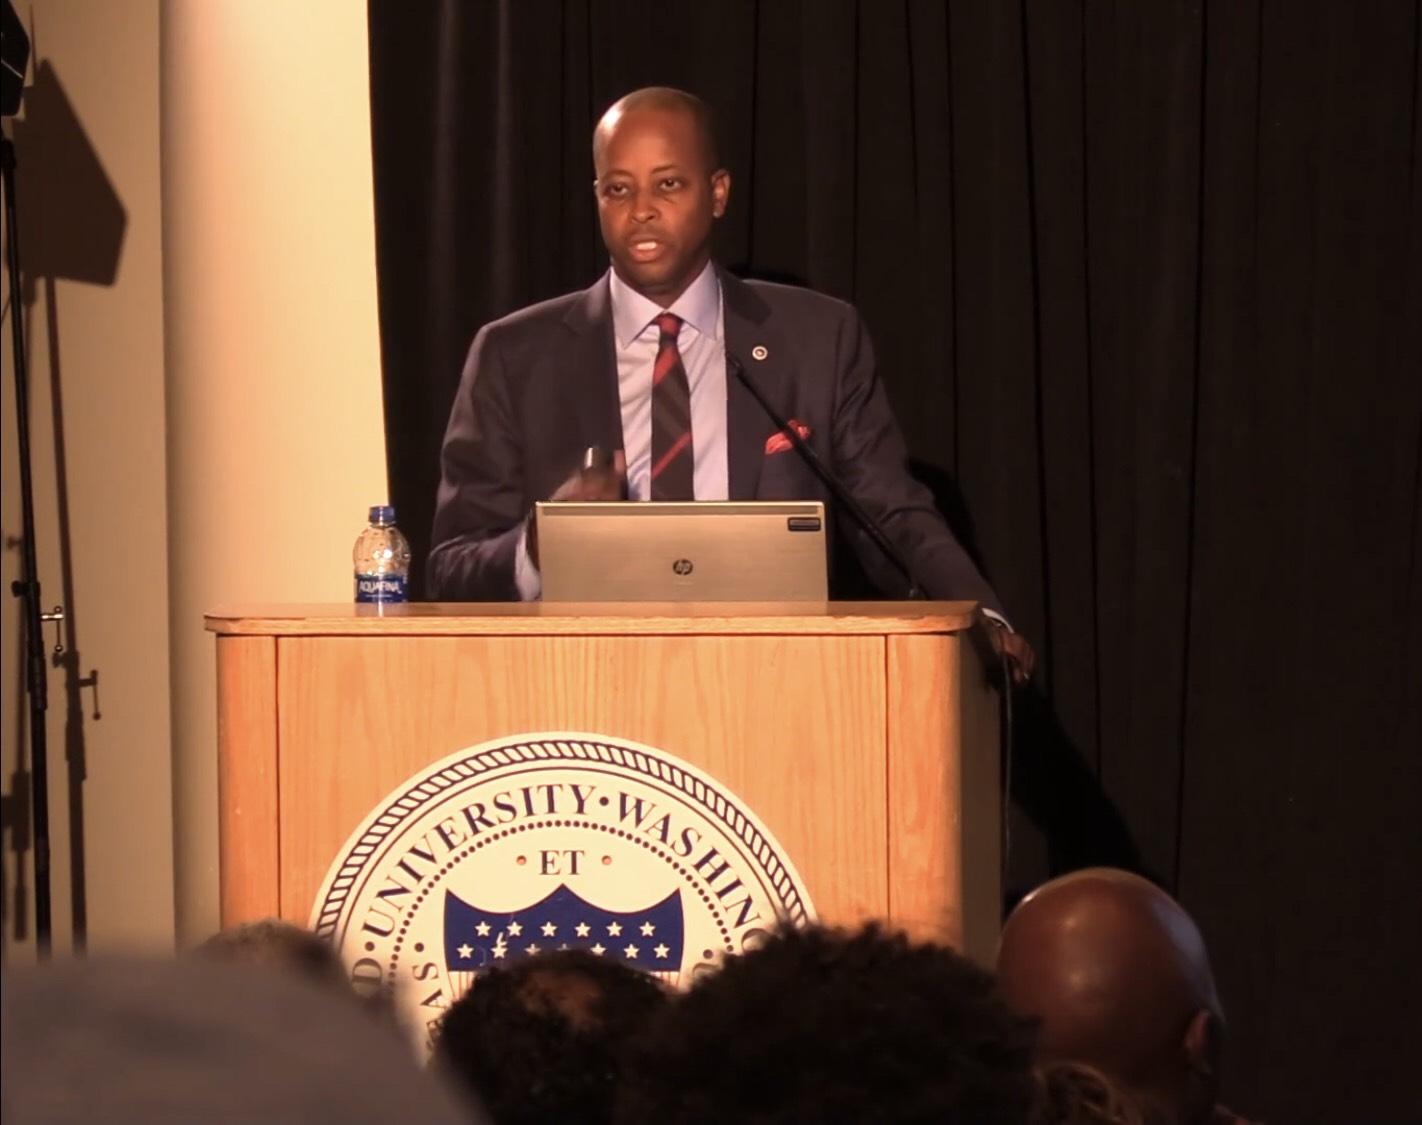 Howard University President Wayne Frederick Speaks on the State of the University